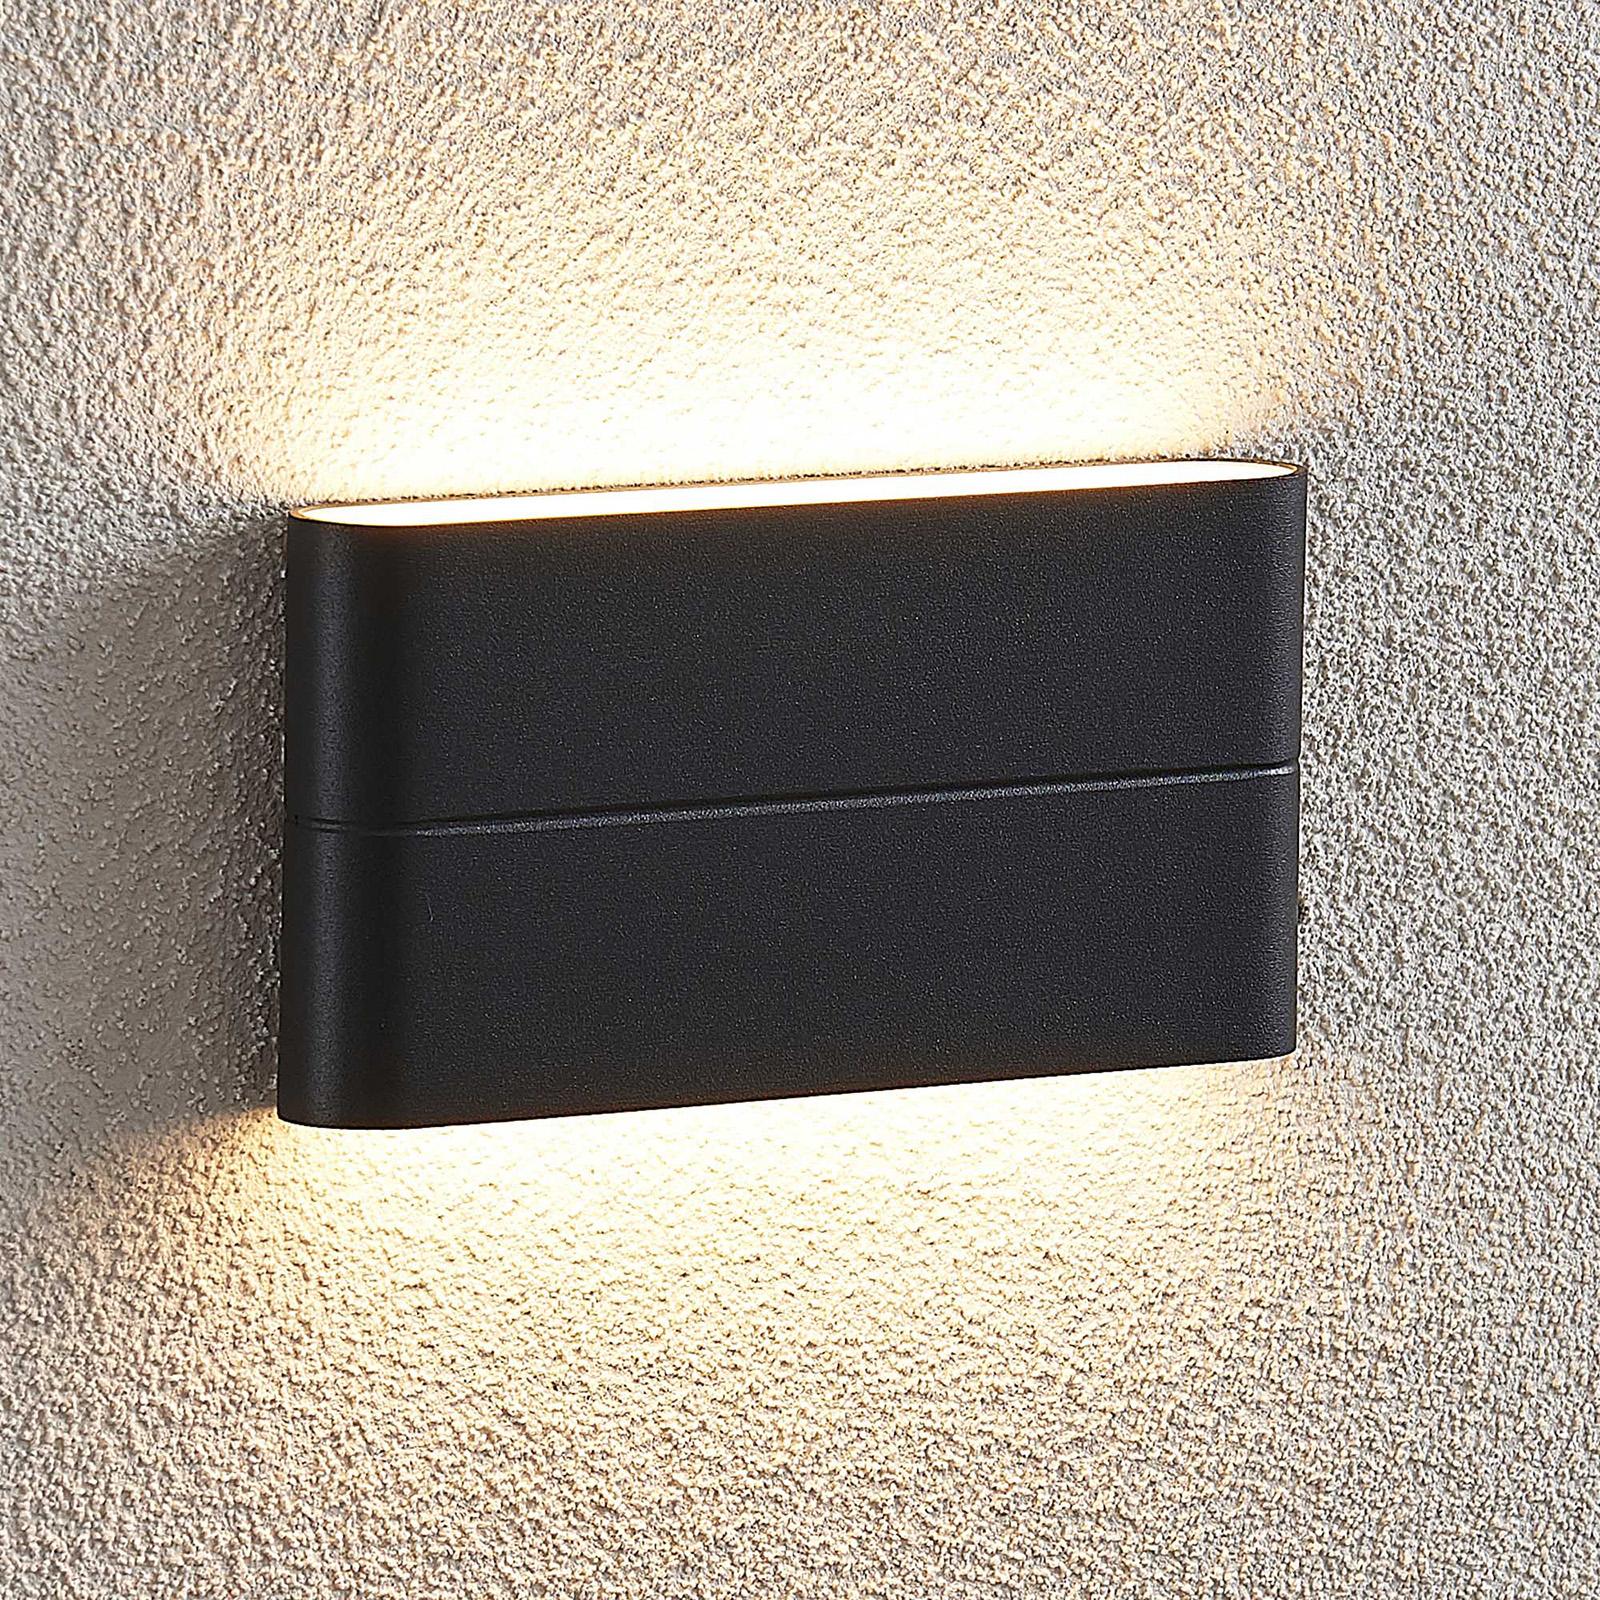 LED-Außenwandleuchte Salka, dunkelgrau, 17,5 cm